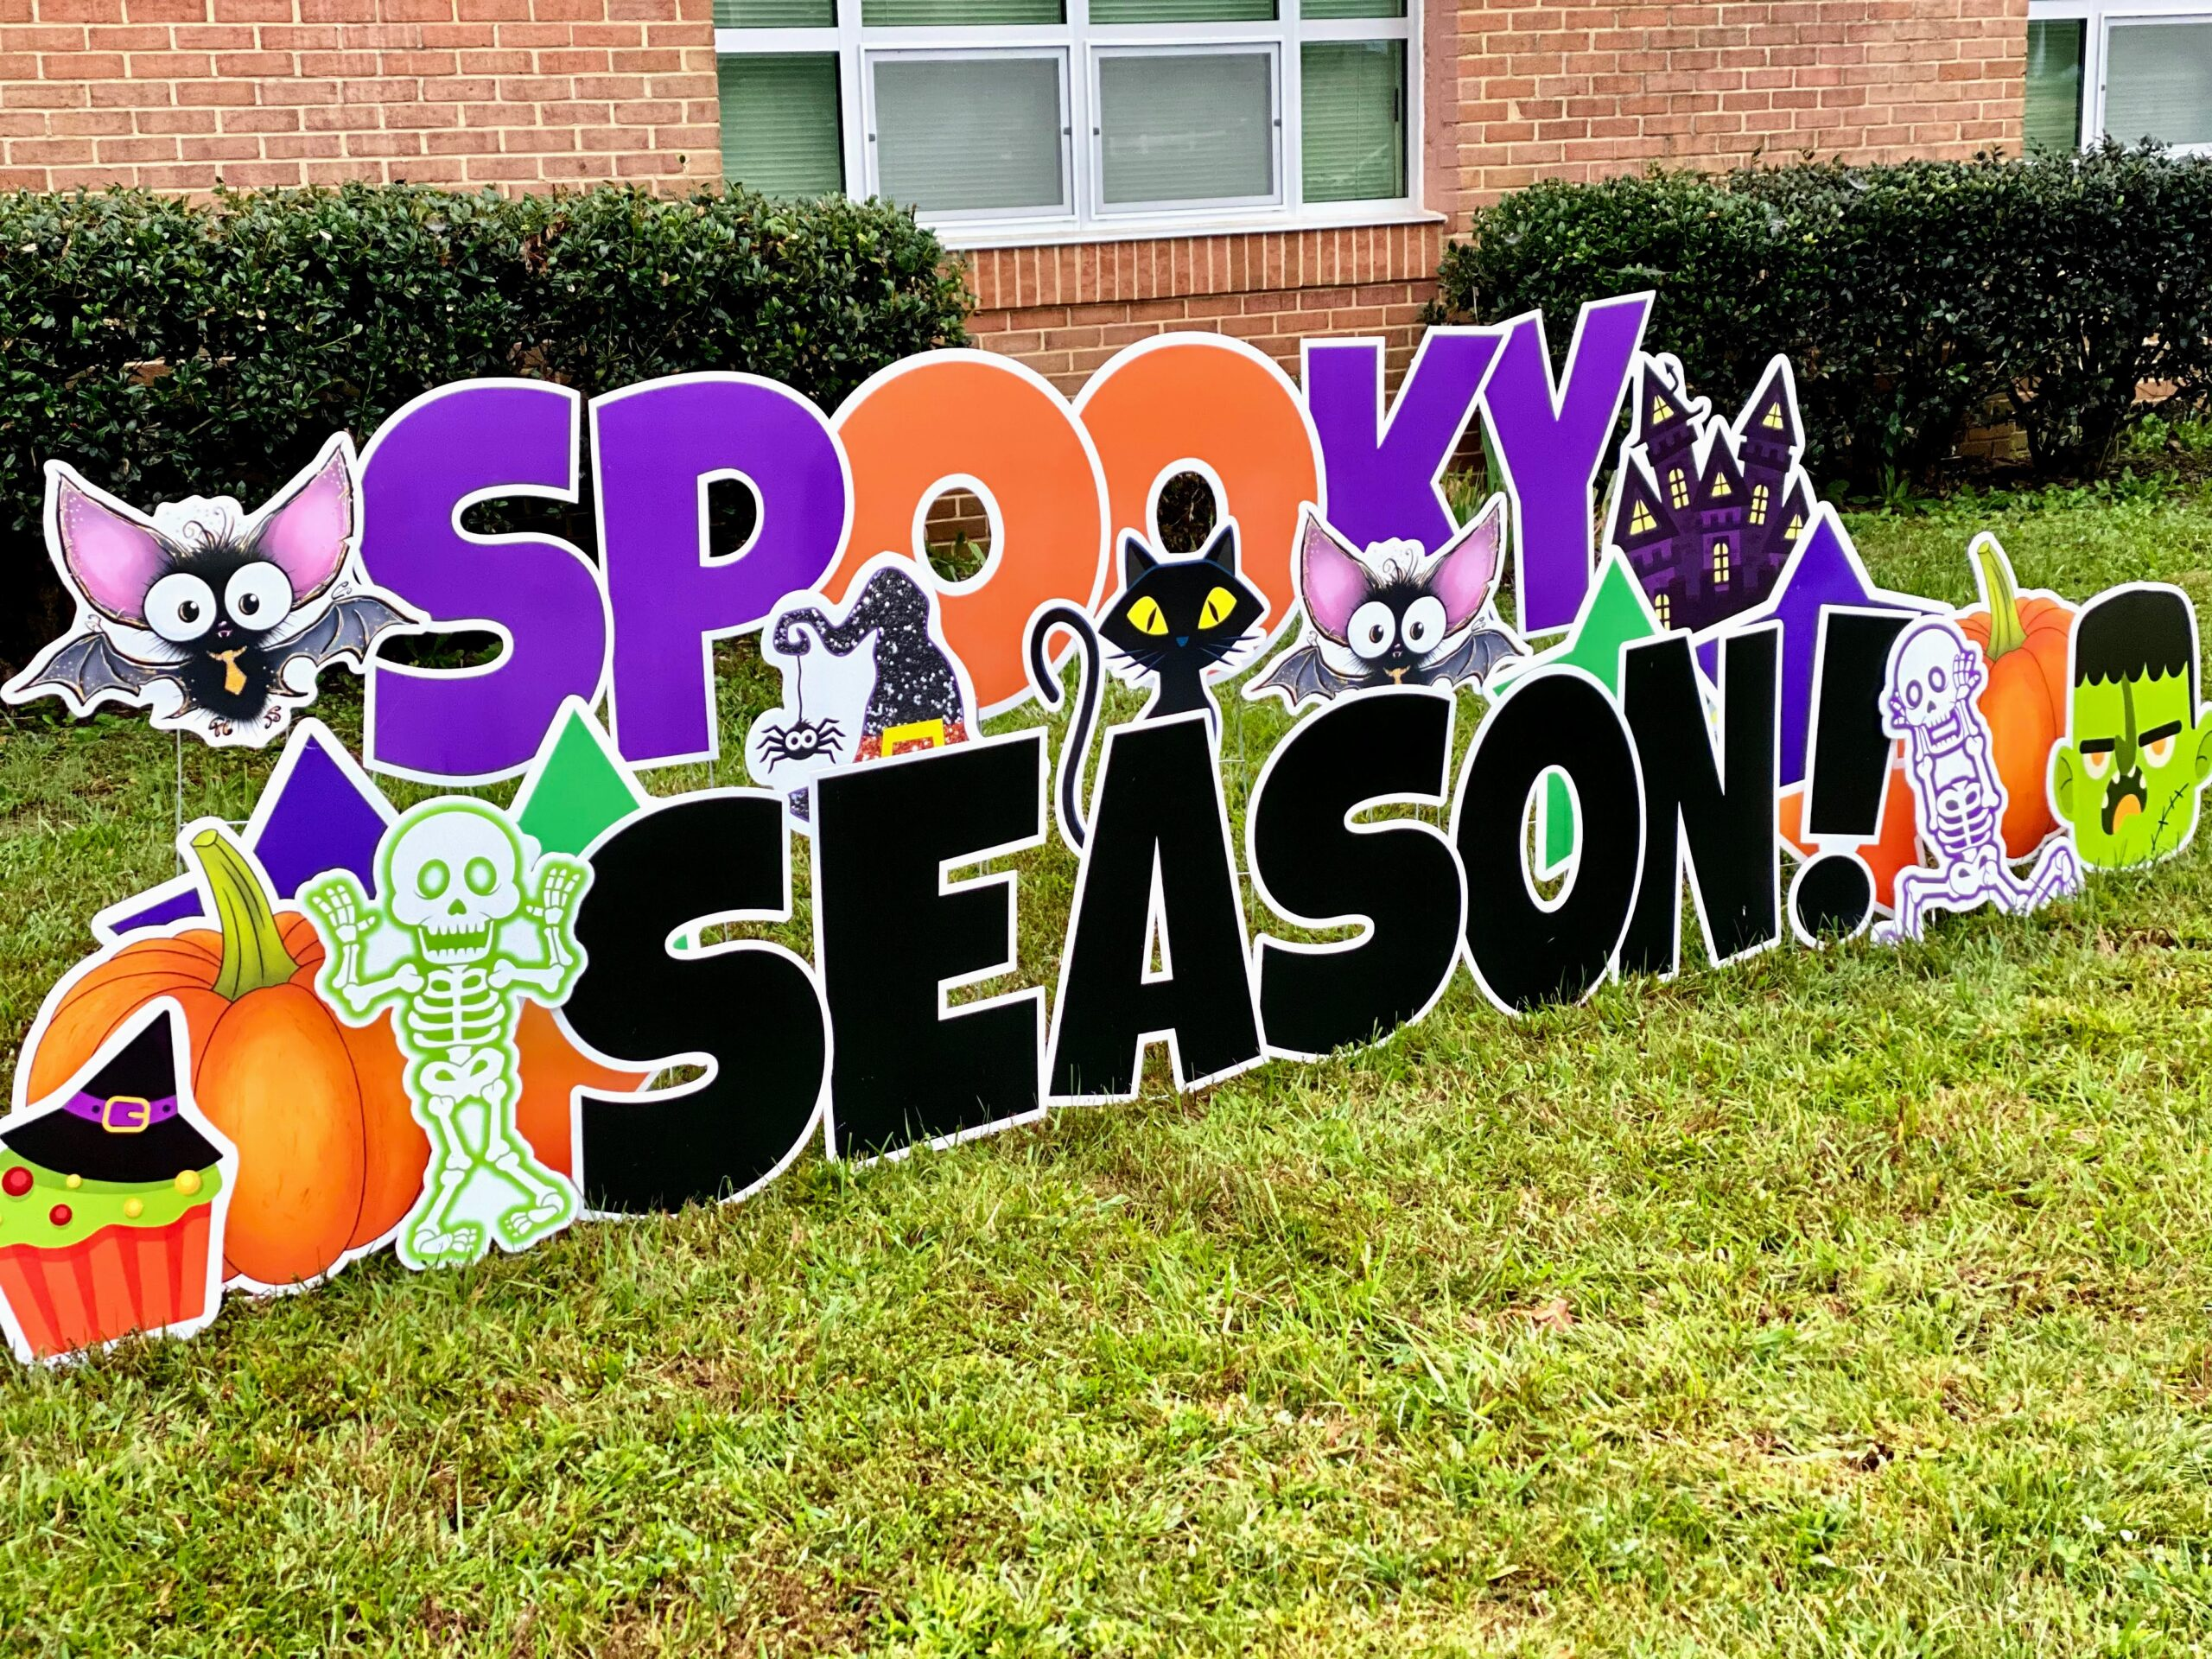 spooky season halloween yard card springfield va